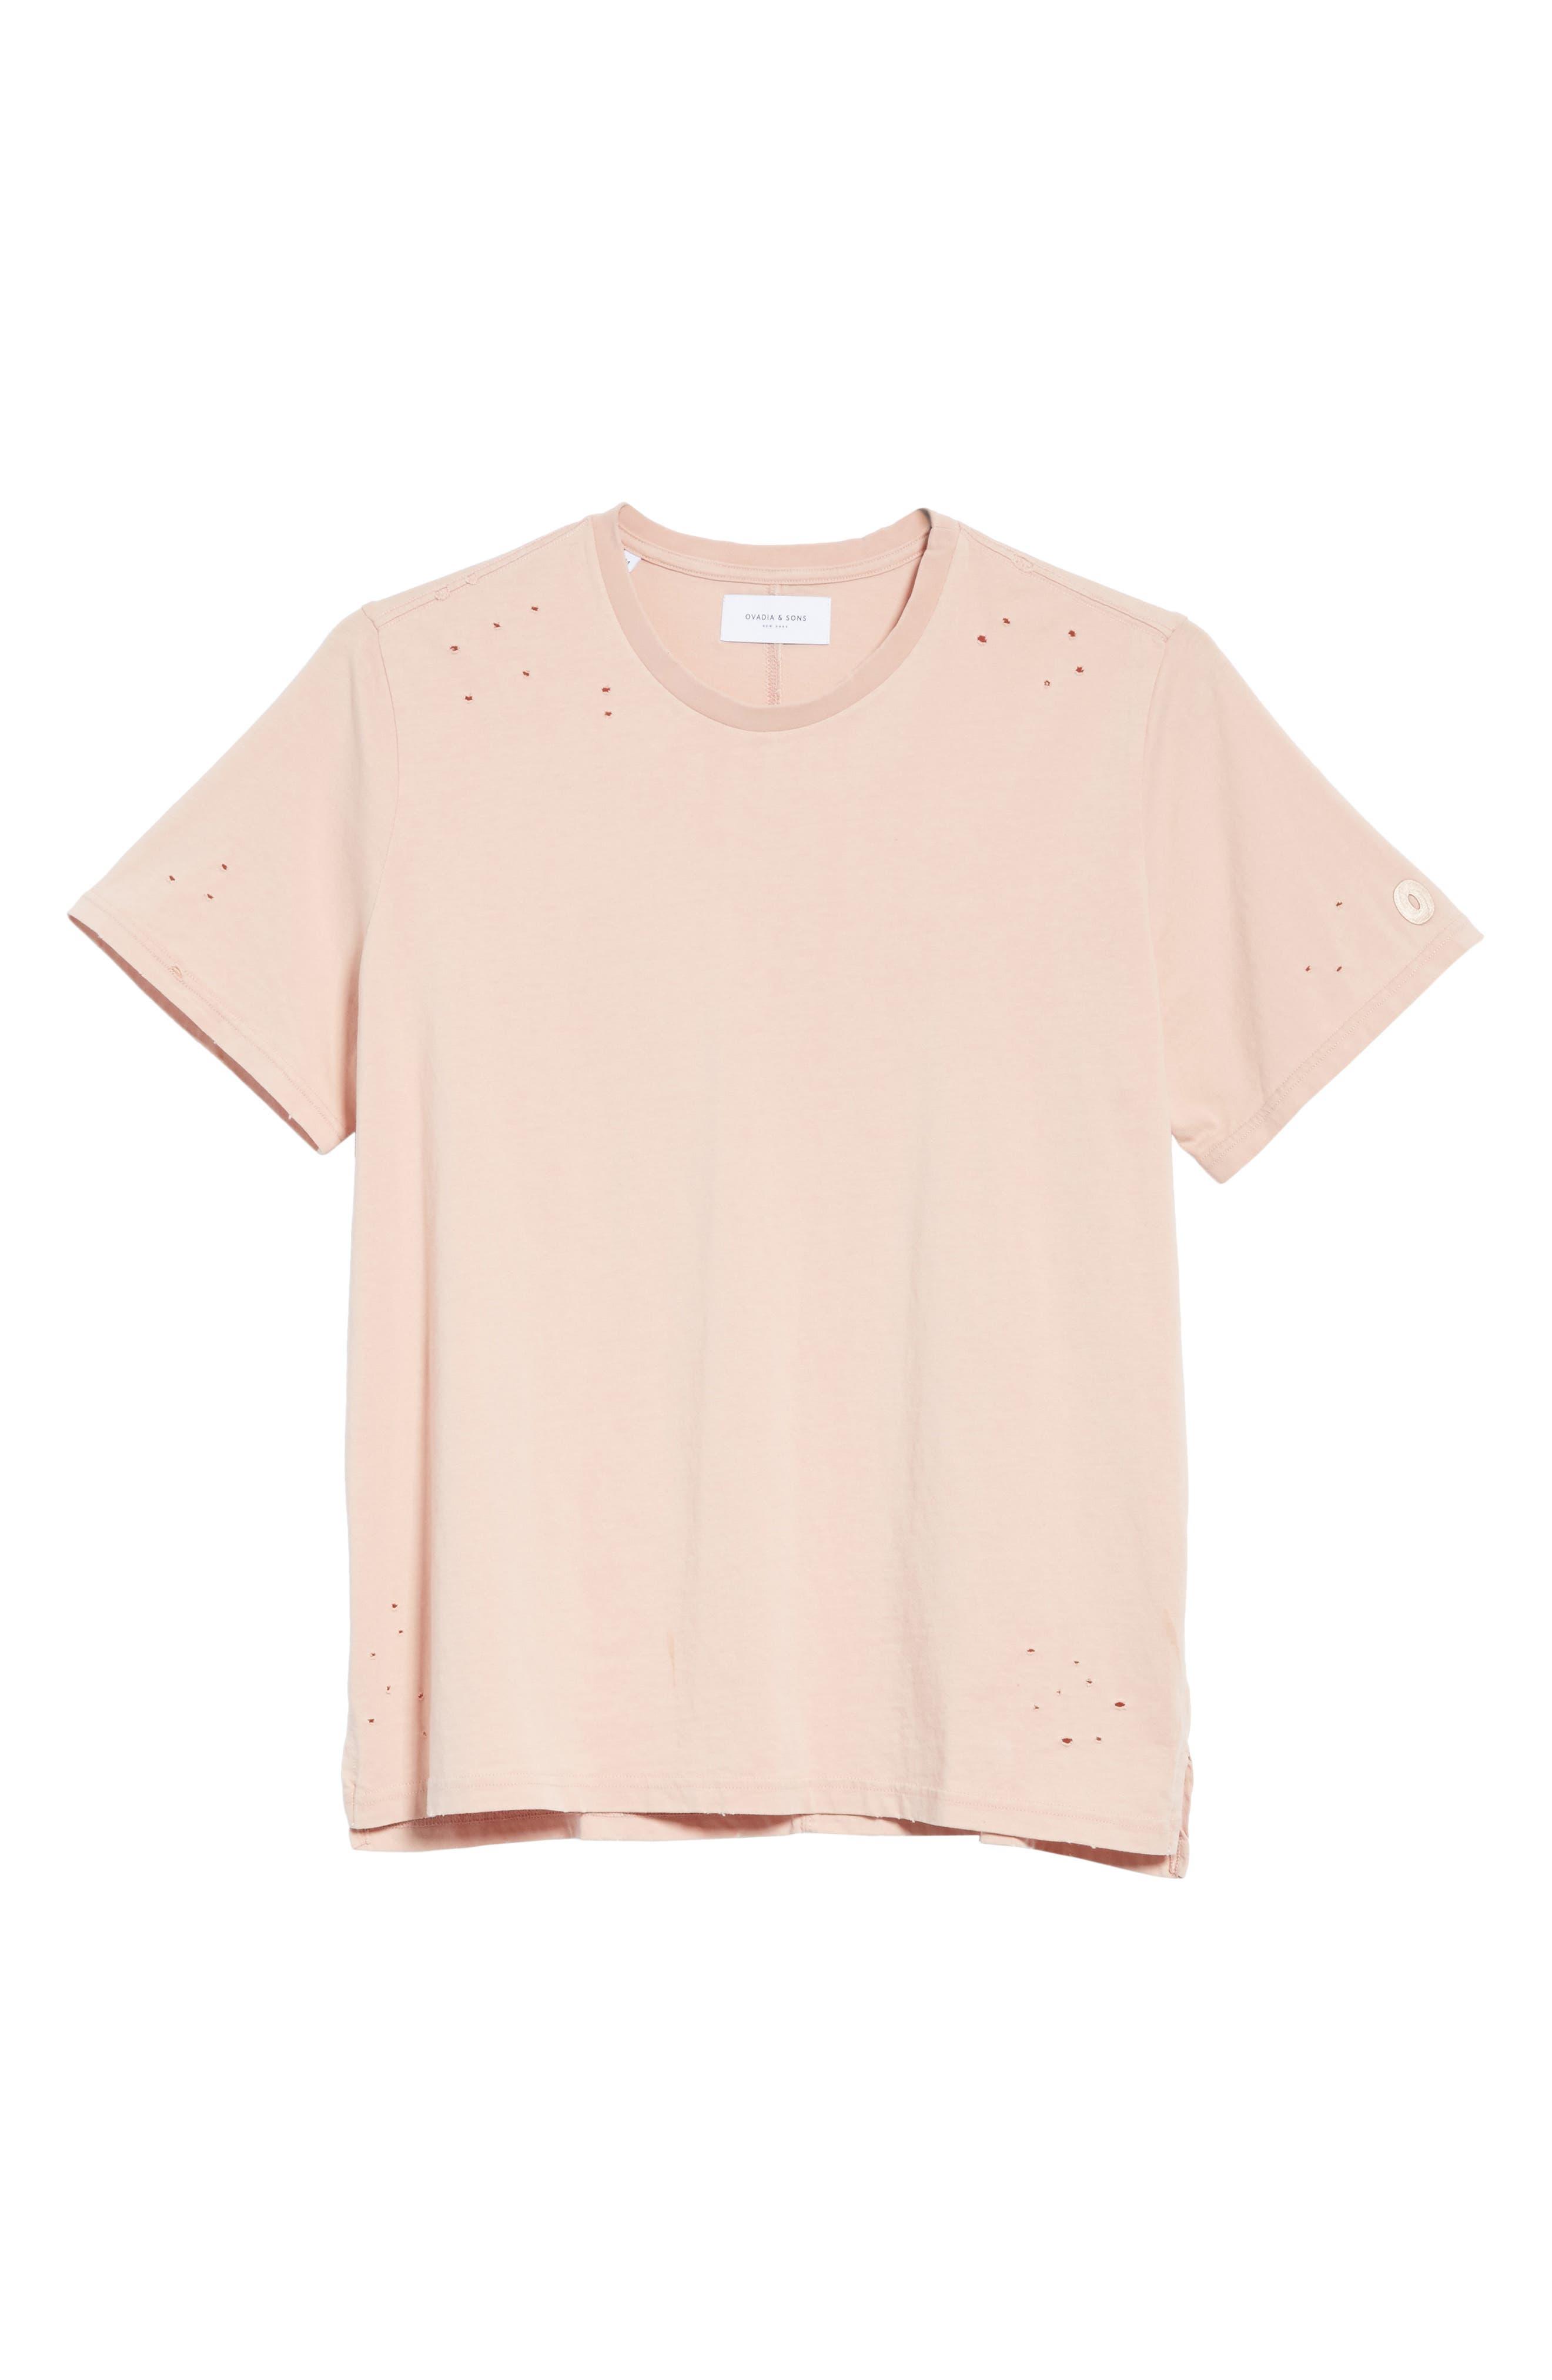 Distressed Crewneck T-Shirt,                             Alternate thumbnail 6, color,                             SALMON